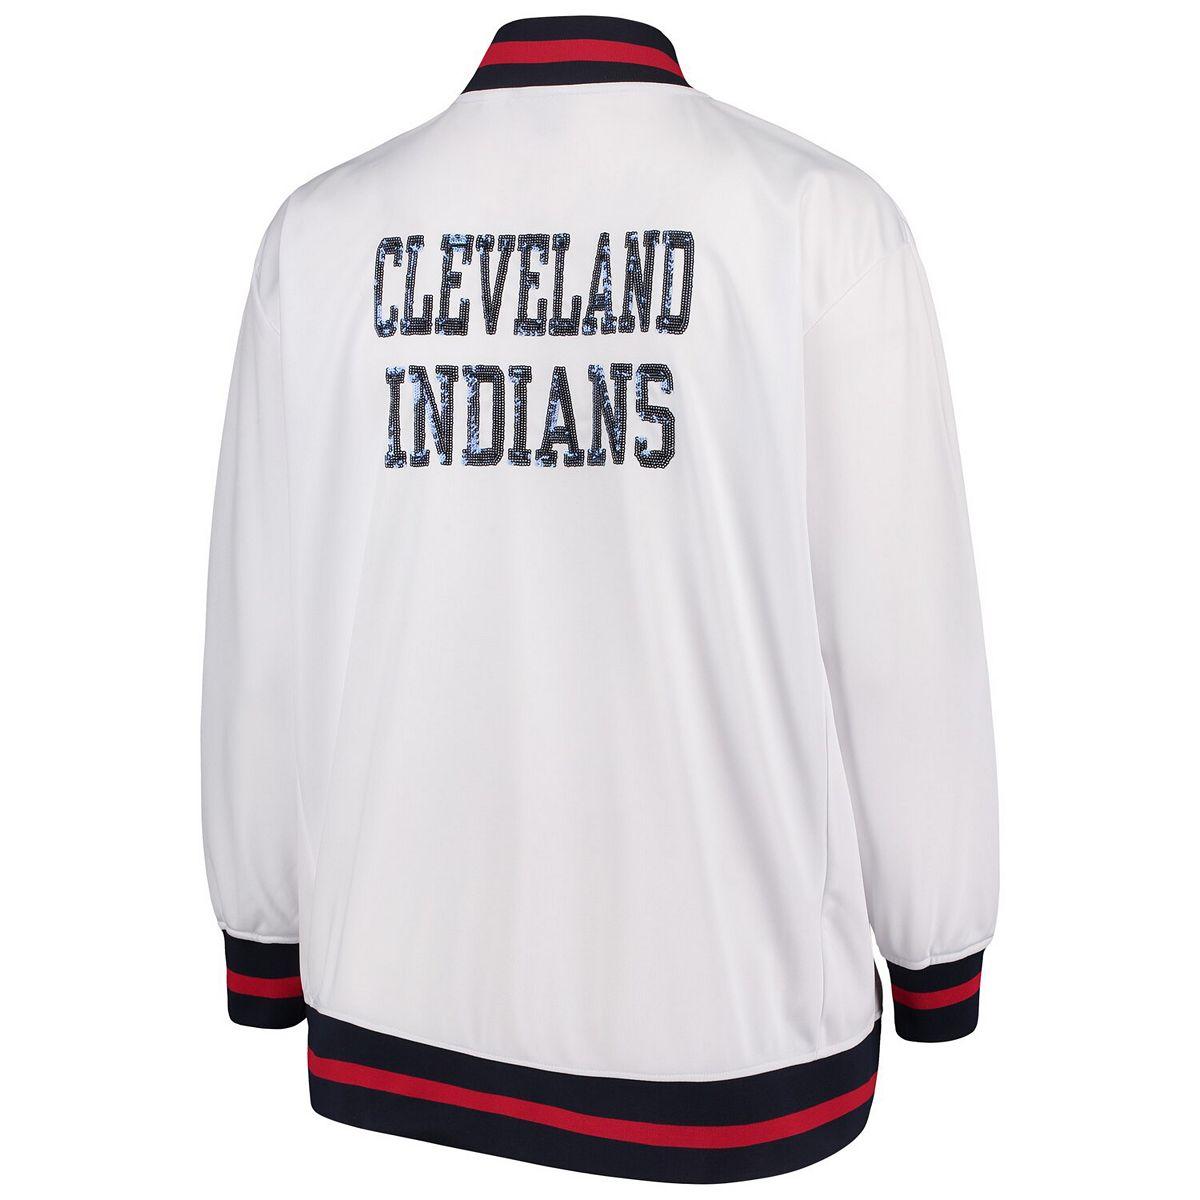 Women's Majestic White Cleveland Indians Plus Size Full Zip Track Jacket lDwRX